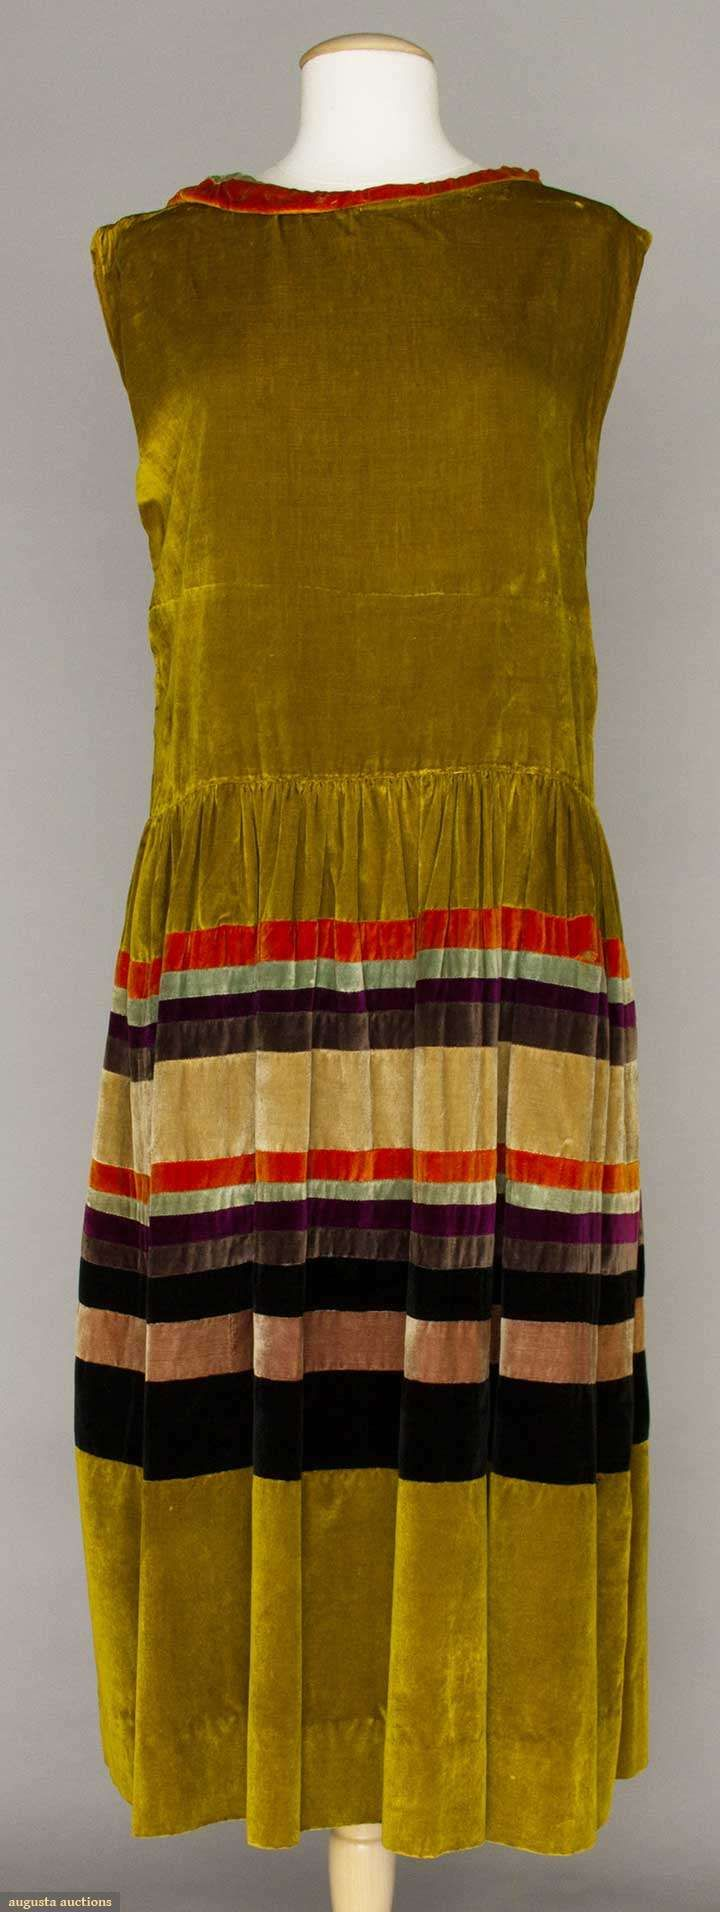 MARGARETE NEUMANN VELVET DRESS, GERMANY, 1920s Found on Karin Bengtsson amazing Board Things to wear. Karian is a very talented Swedish Painter and Textile designer. (Pharyah)